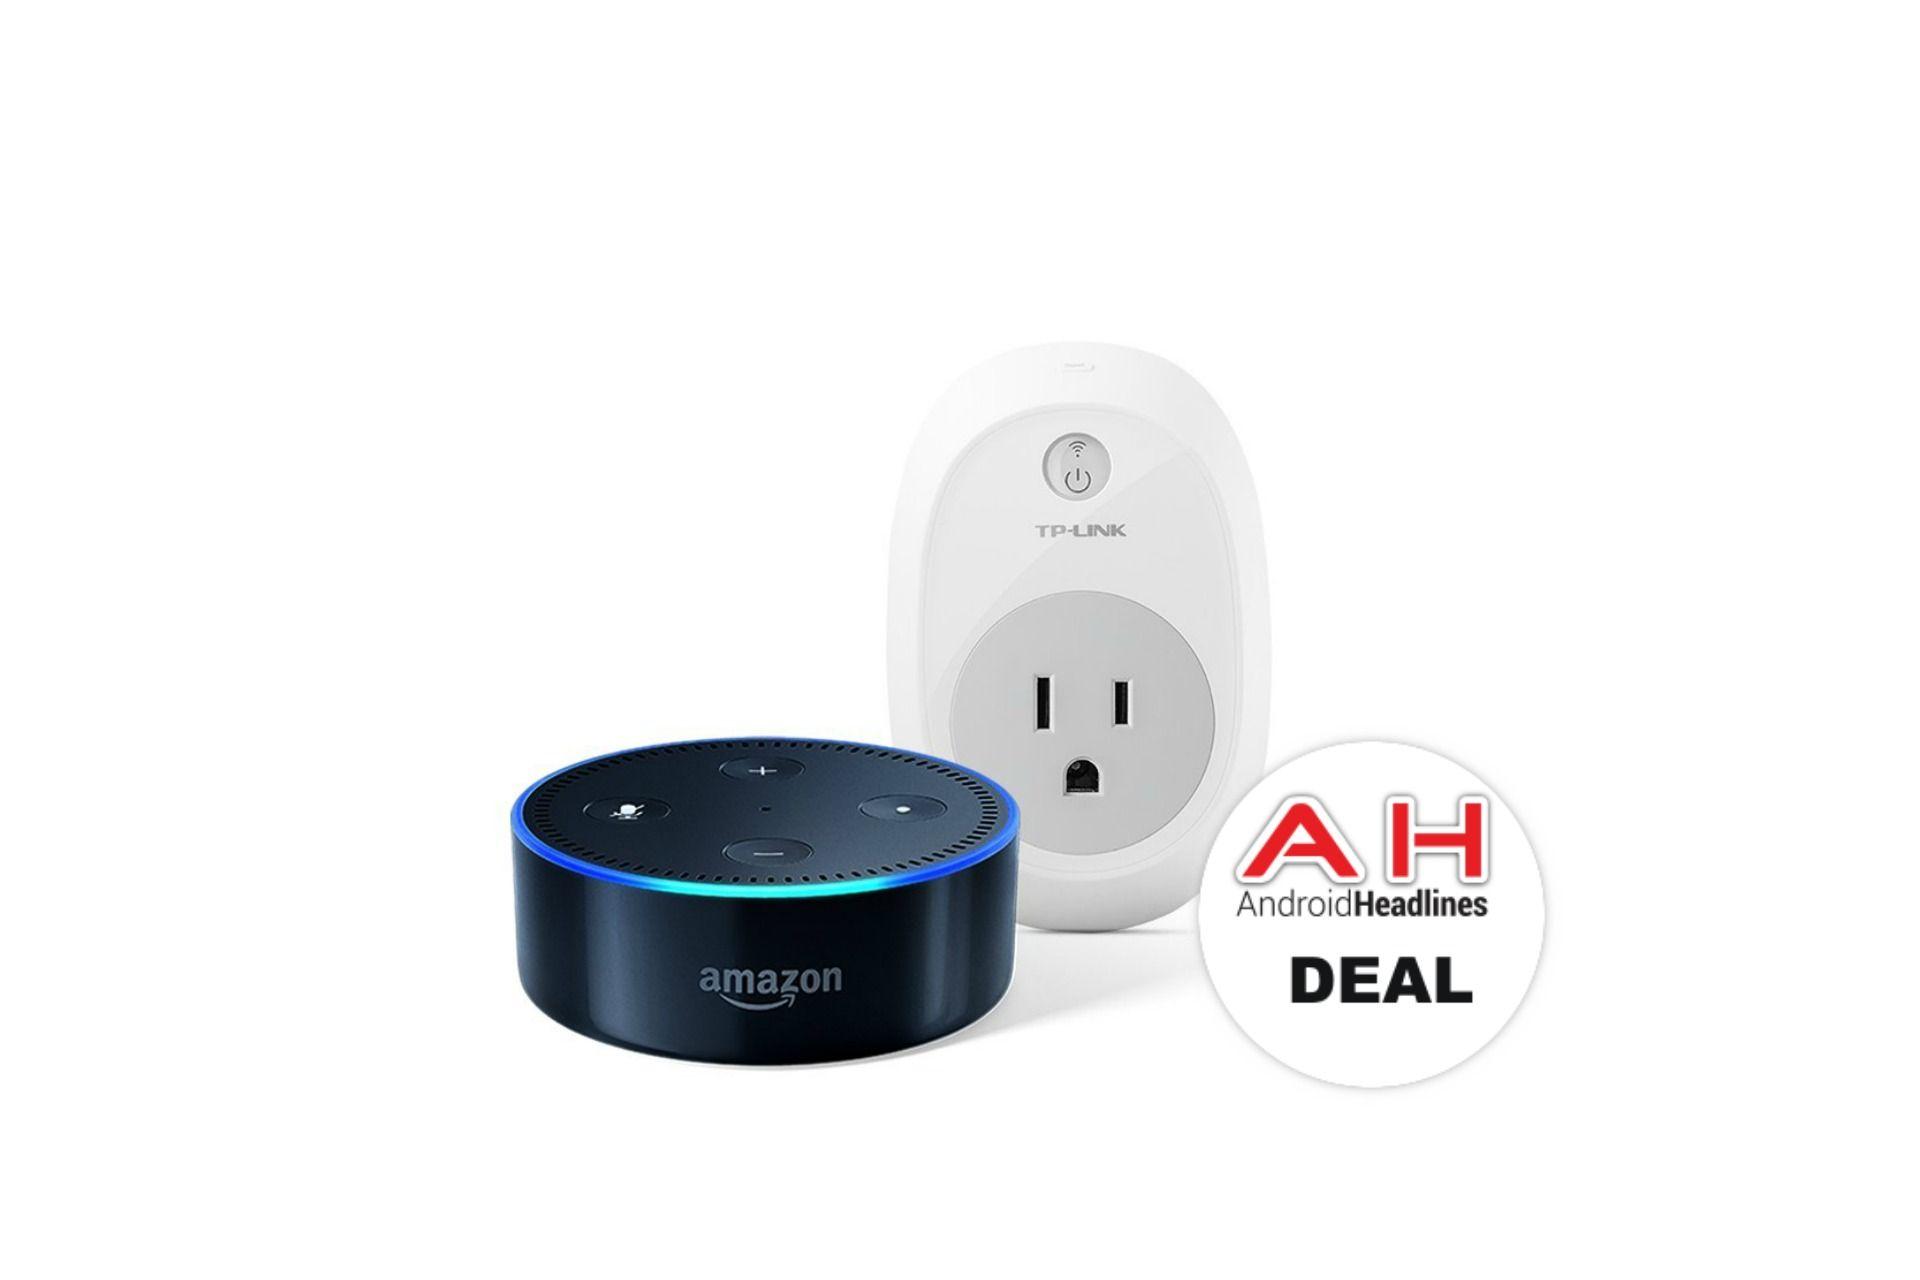 ICYMI: Deal: Amazon Echo Dot & TP-Link Smart Plug Bundle For